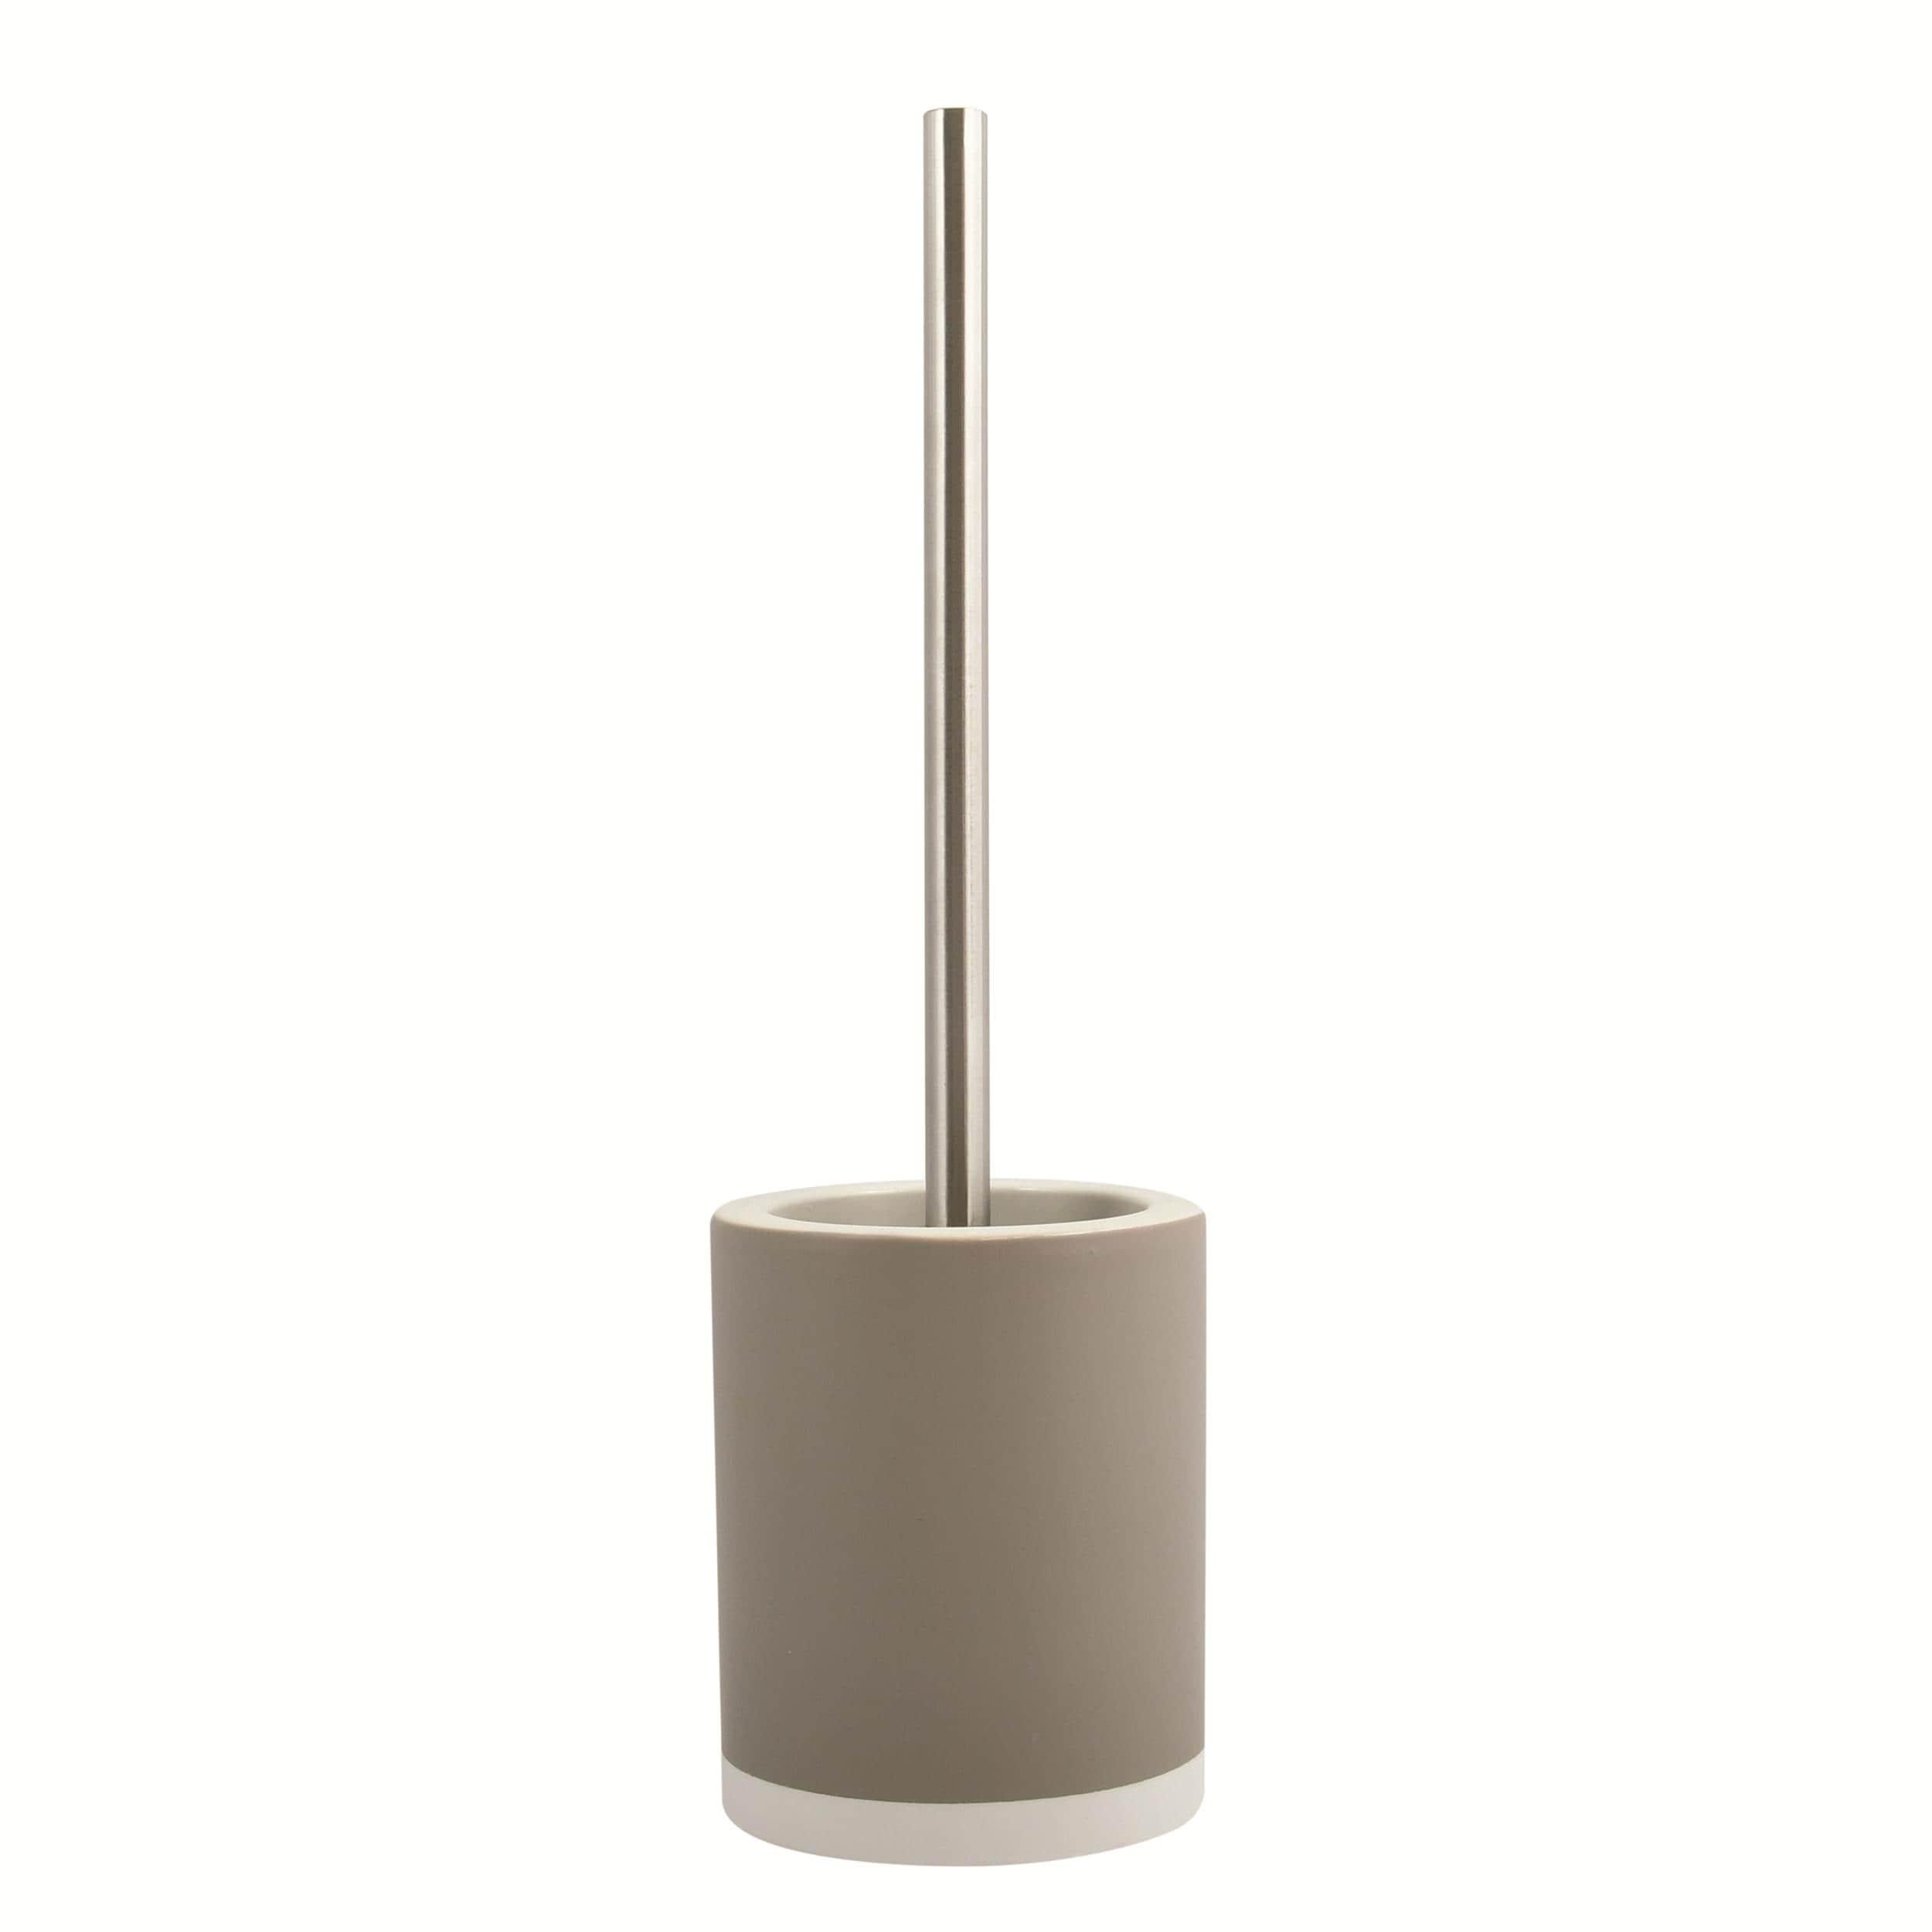 Toilet Brush And Holder MSV-France Cagliari Aqua Soft Ceramic